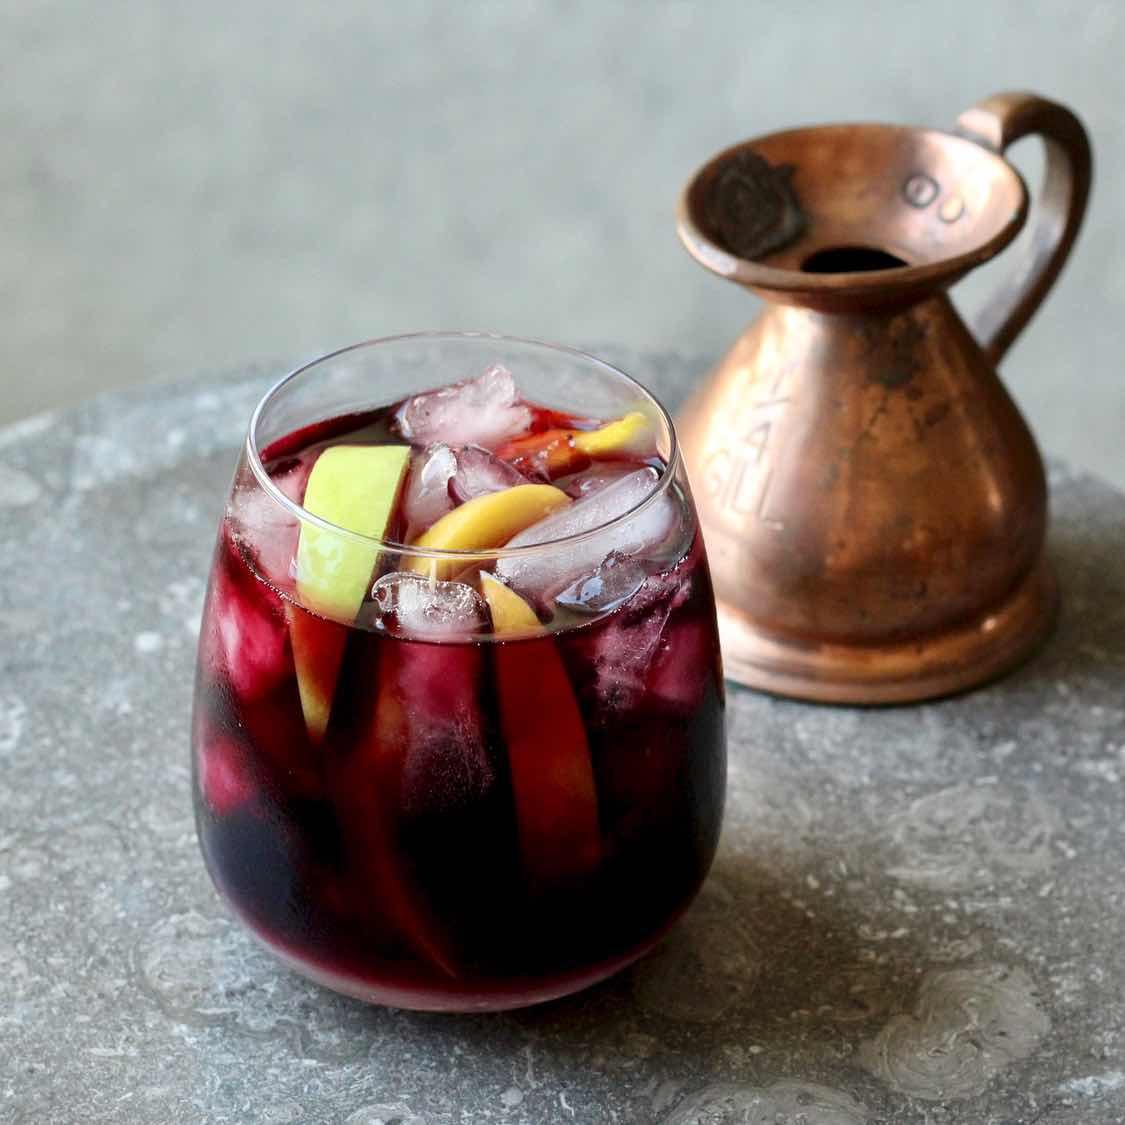 Sangria - Classic Spanish Fortified Wine Recipe